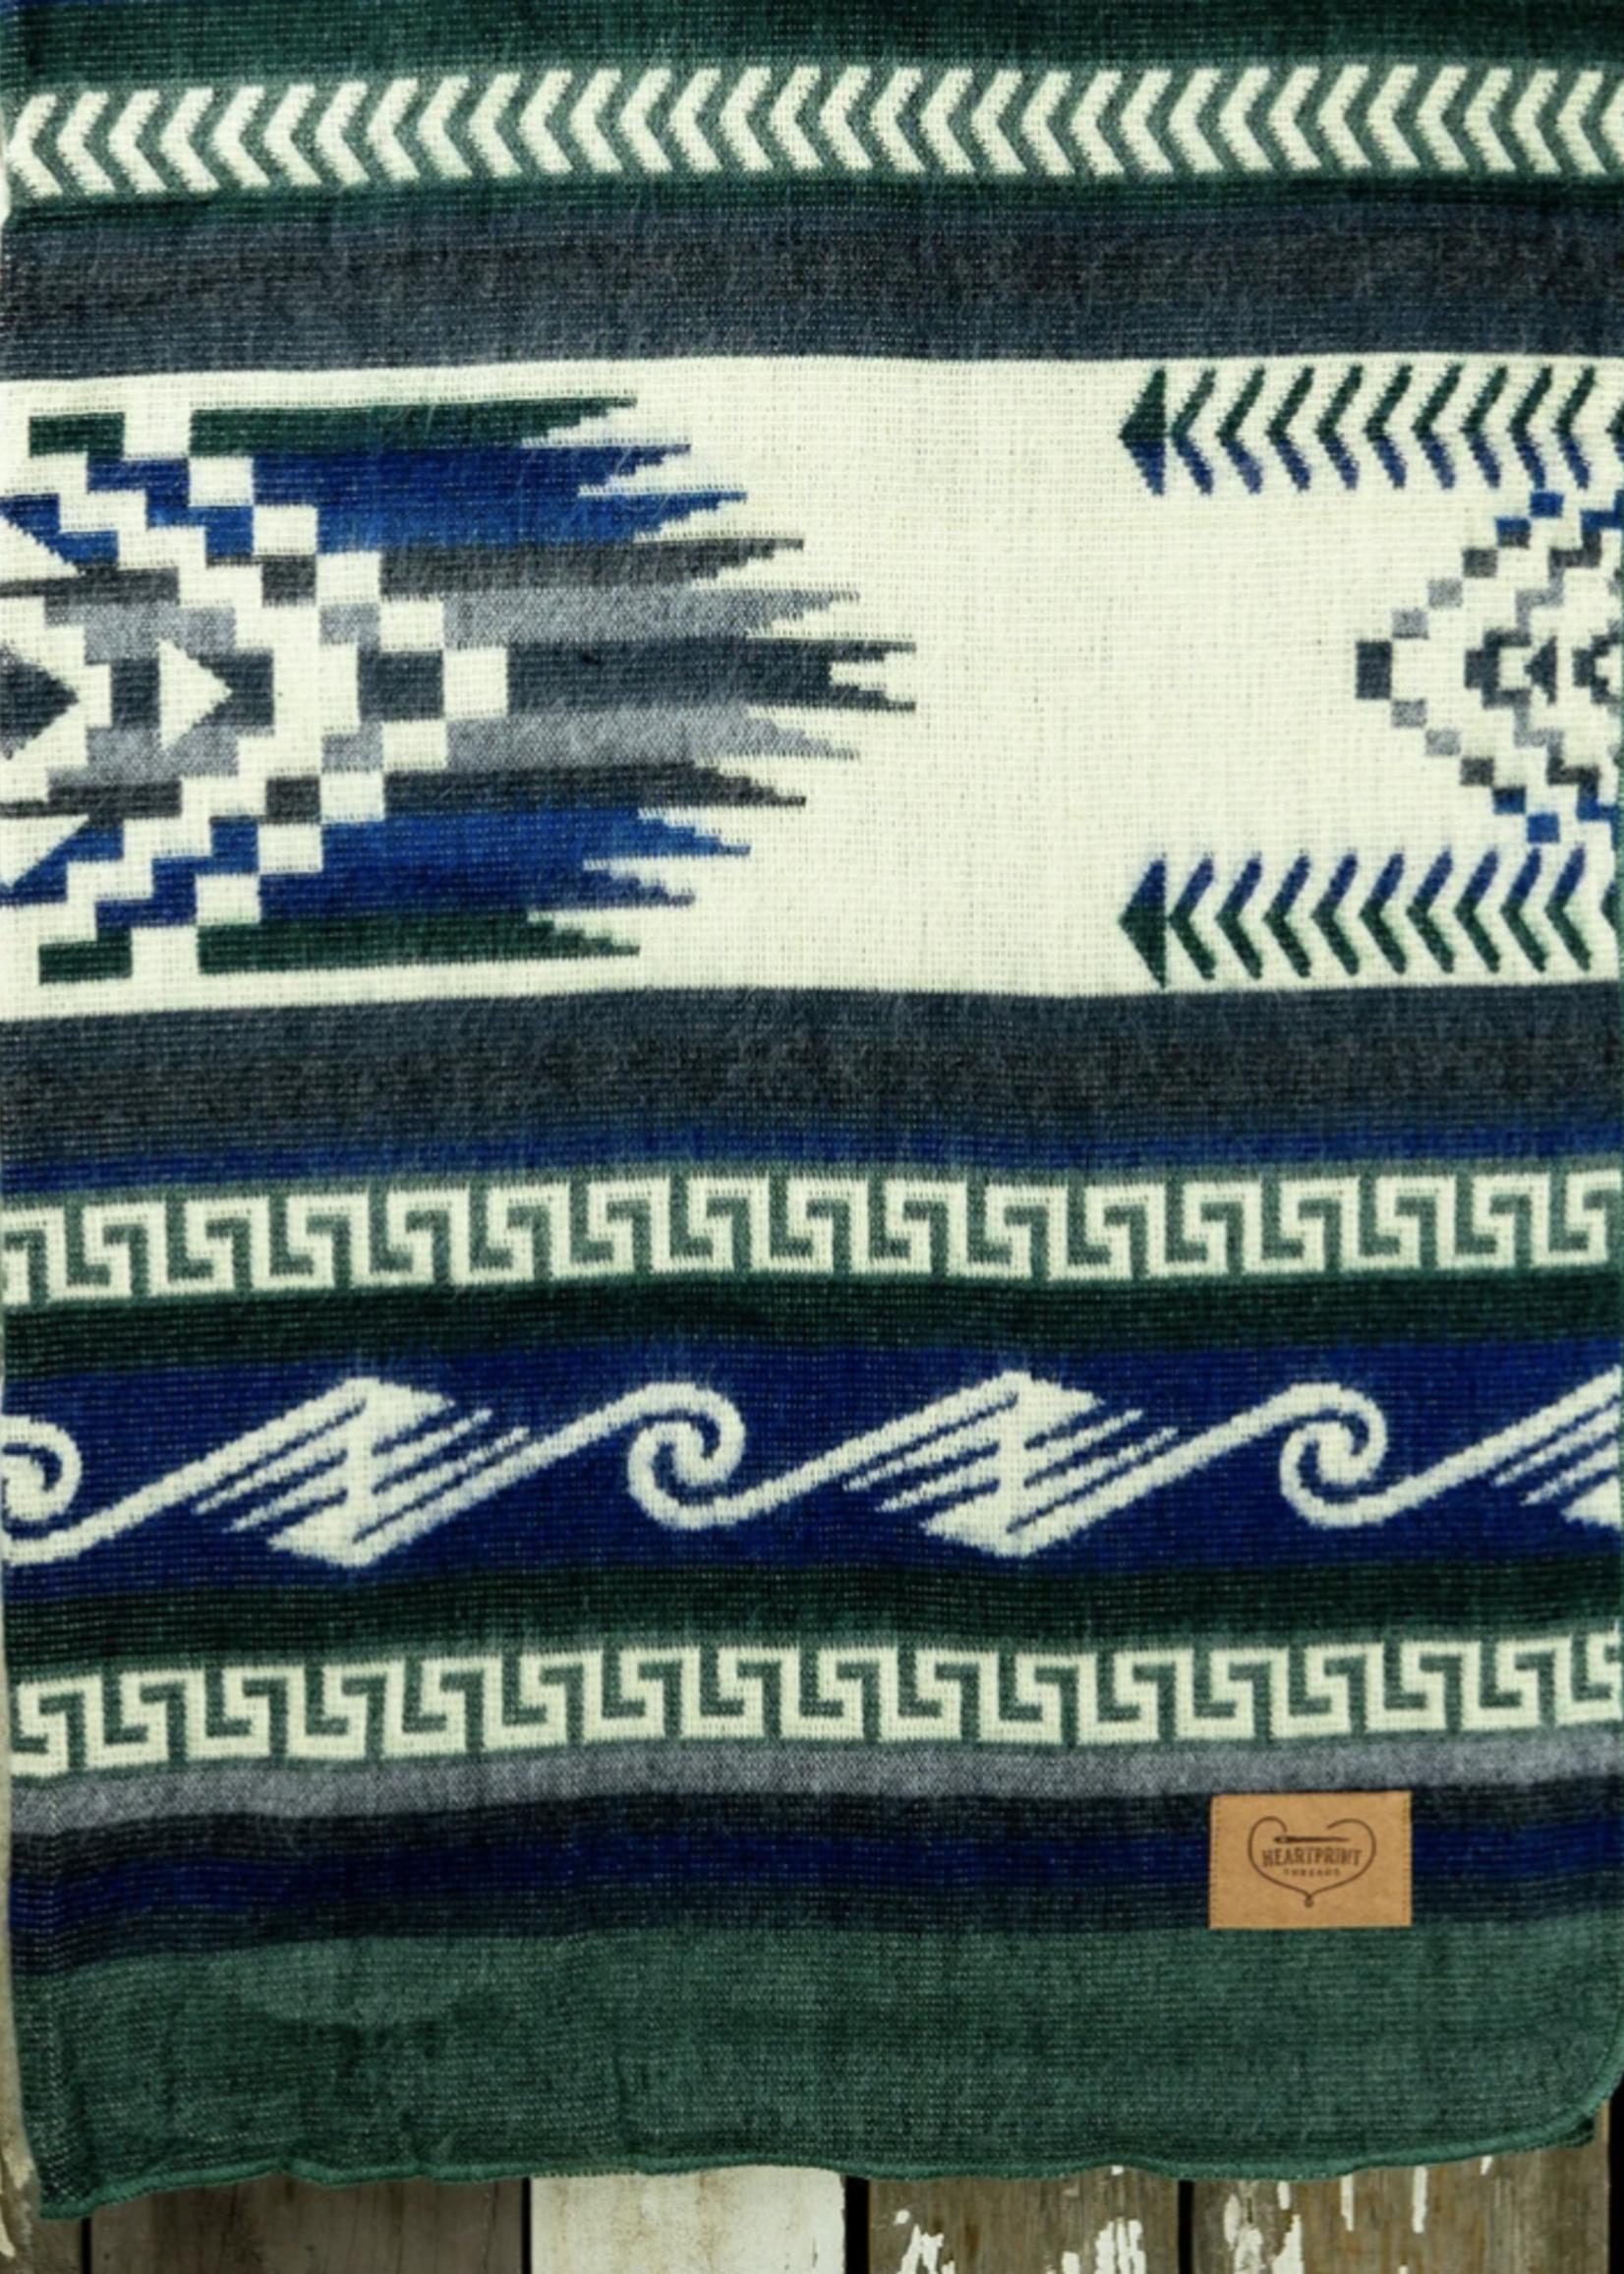 Heartprint Threads Pacific Glows Maskuy Blanket | Queen